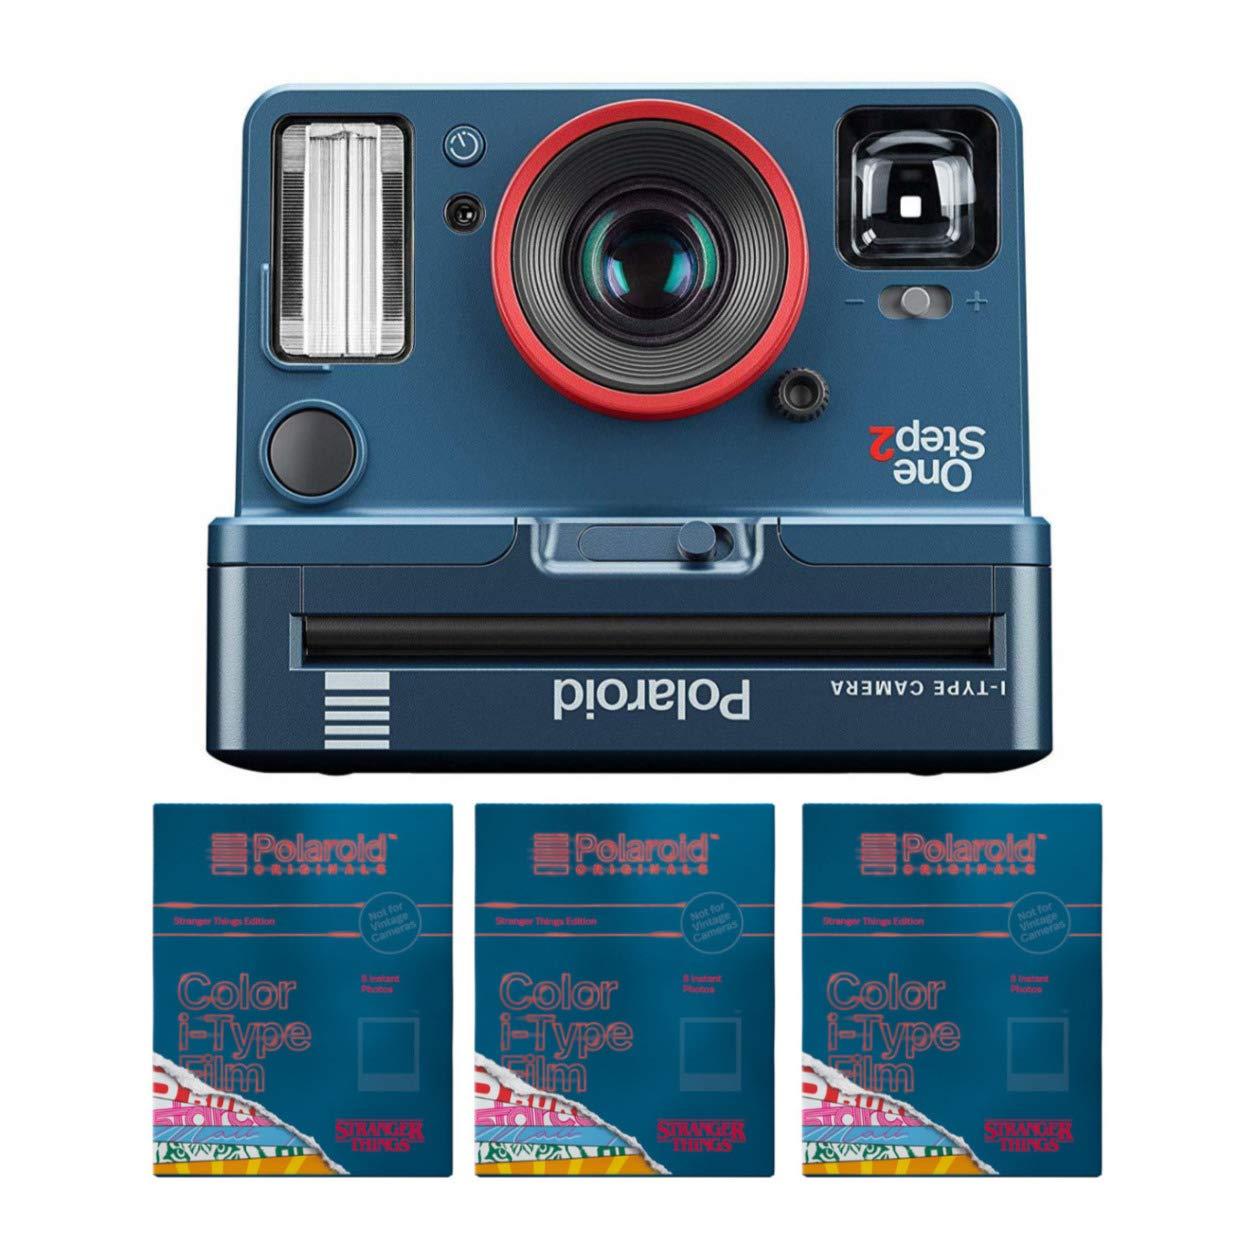 Polaroid Originals OneStep 2 Starter Set - Stranger Things Edition (4 Items) by Polaroid Originals